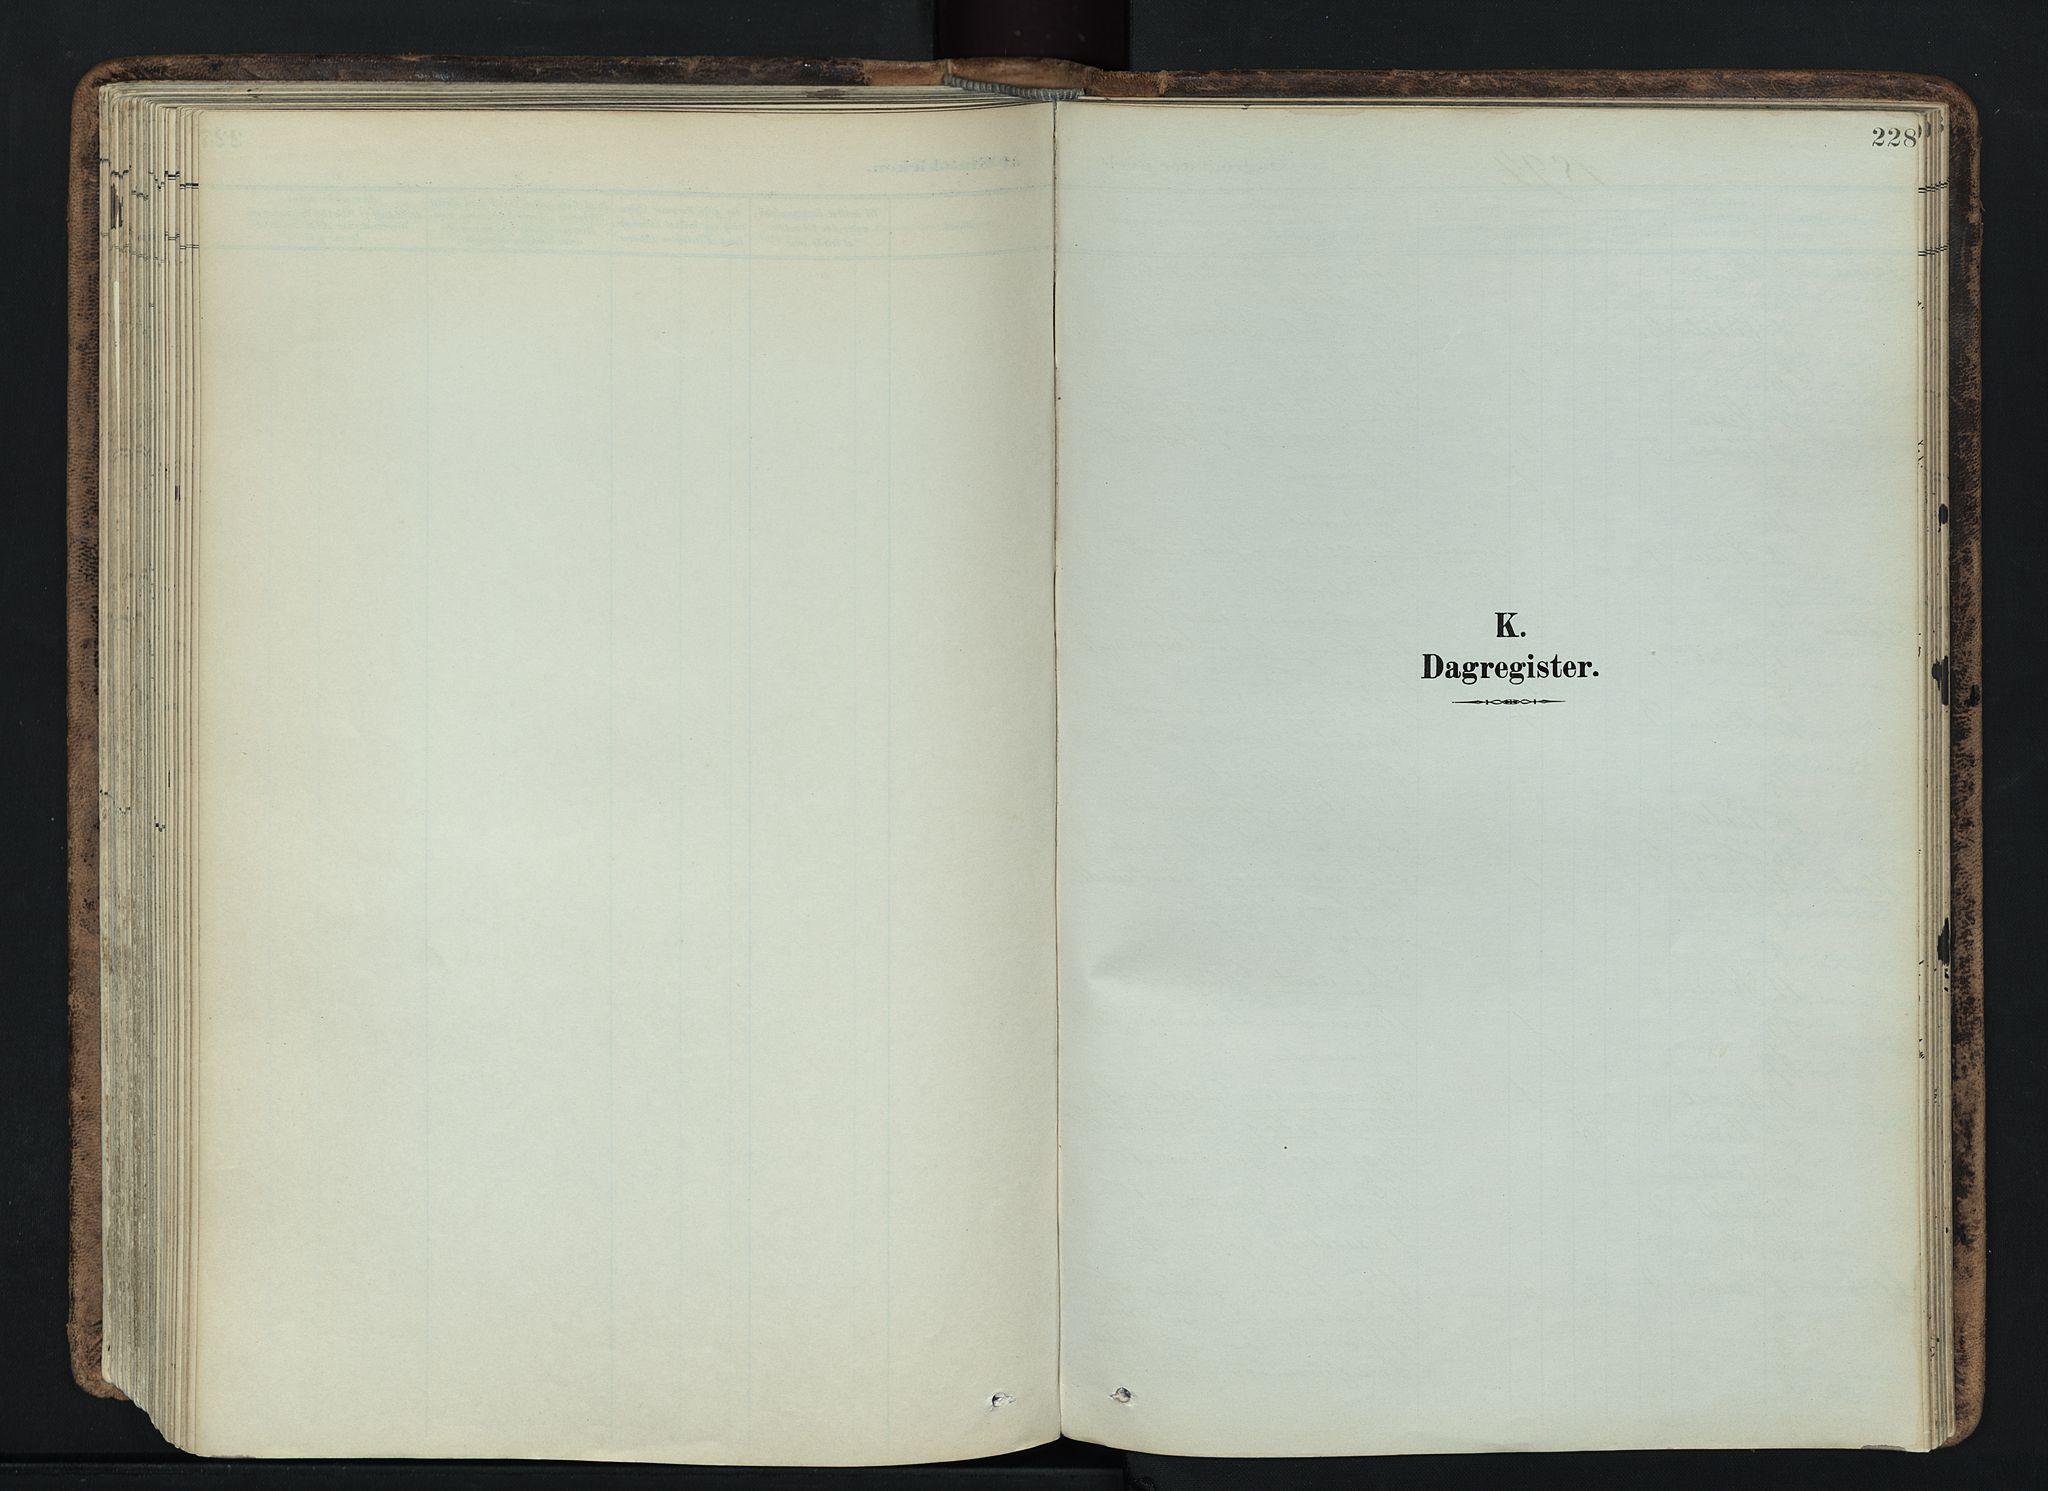 SAH, Vardal prestekontor, H/Ha/Haa/L0019: Ministerialbok nr. 19, 1893-1907, s. 228